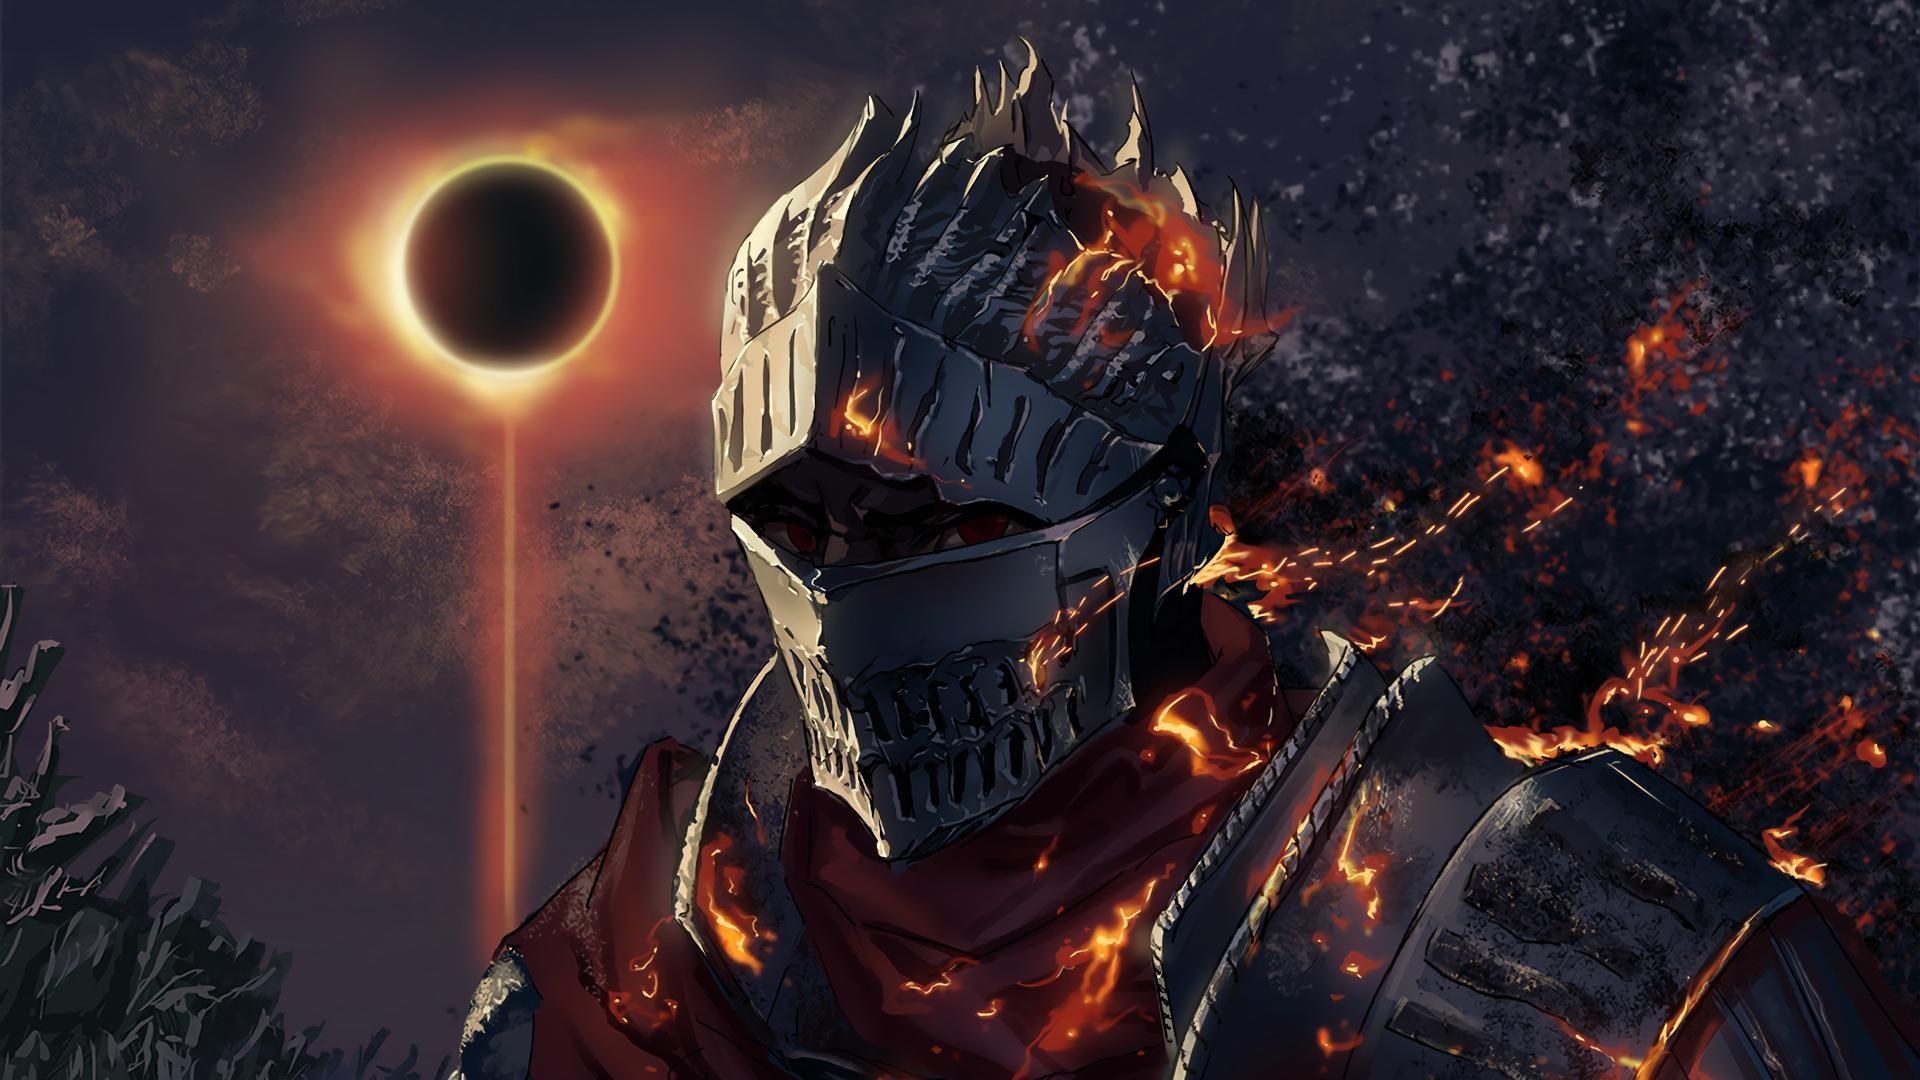 Dark Souls 3 Hd Wallpaper 86 Images